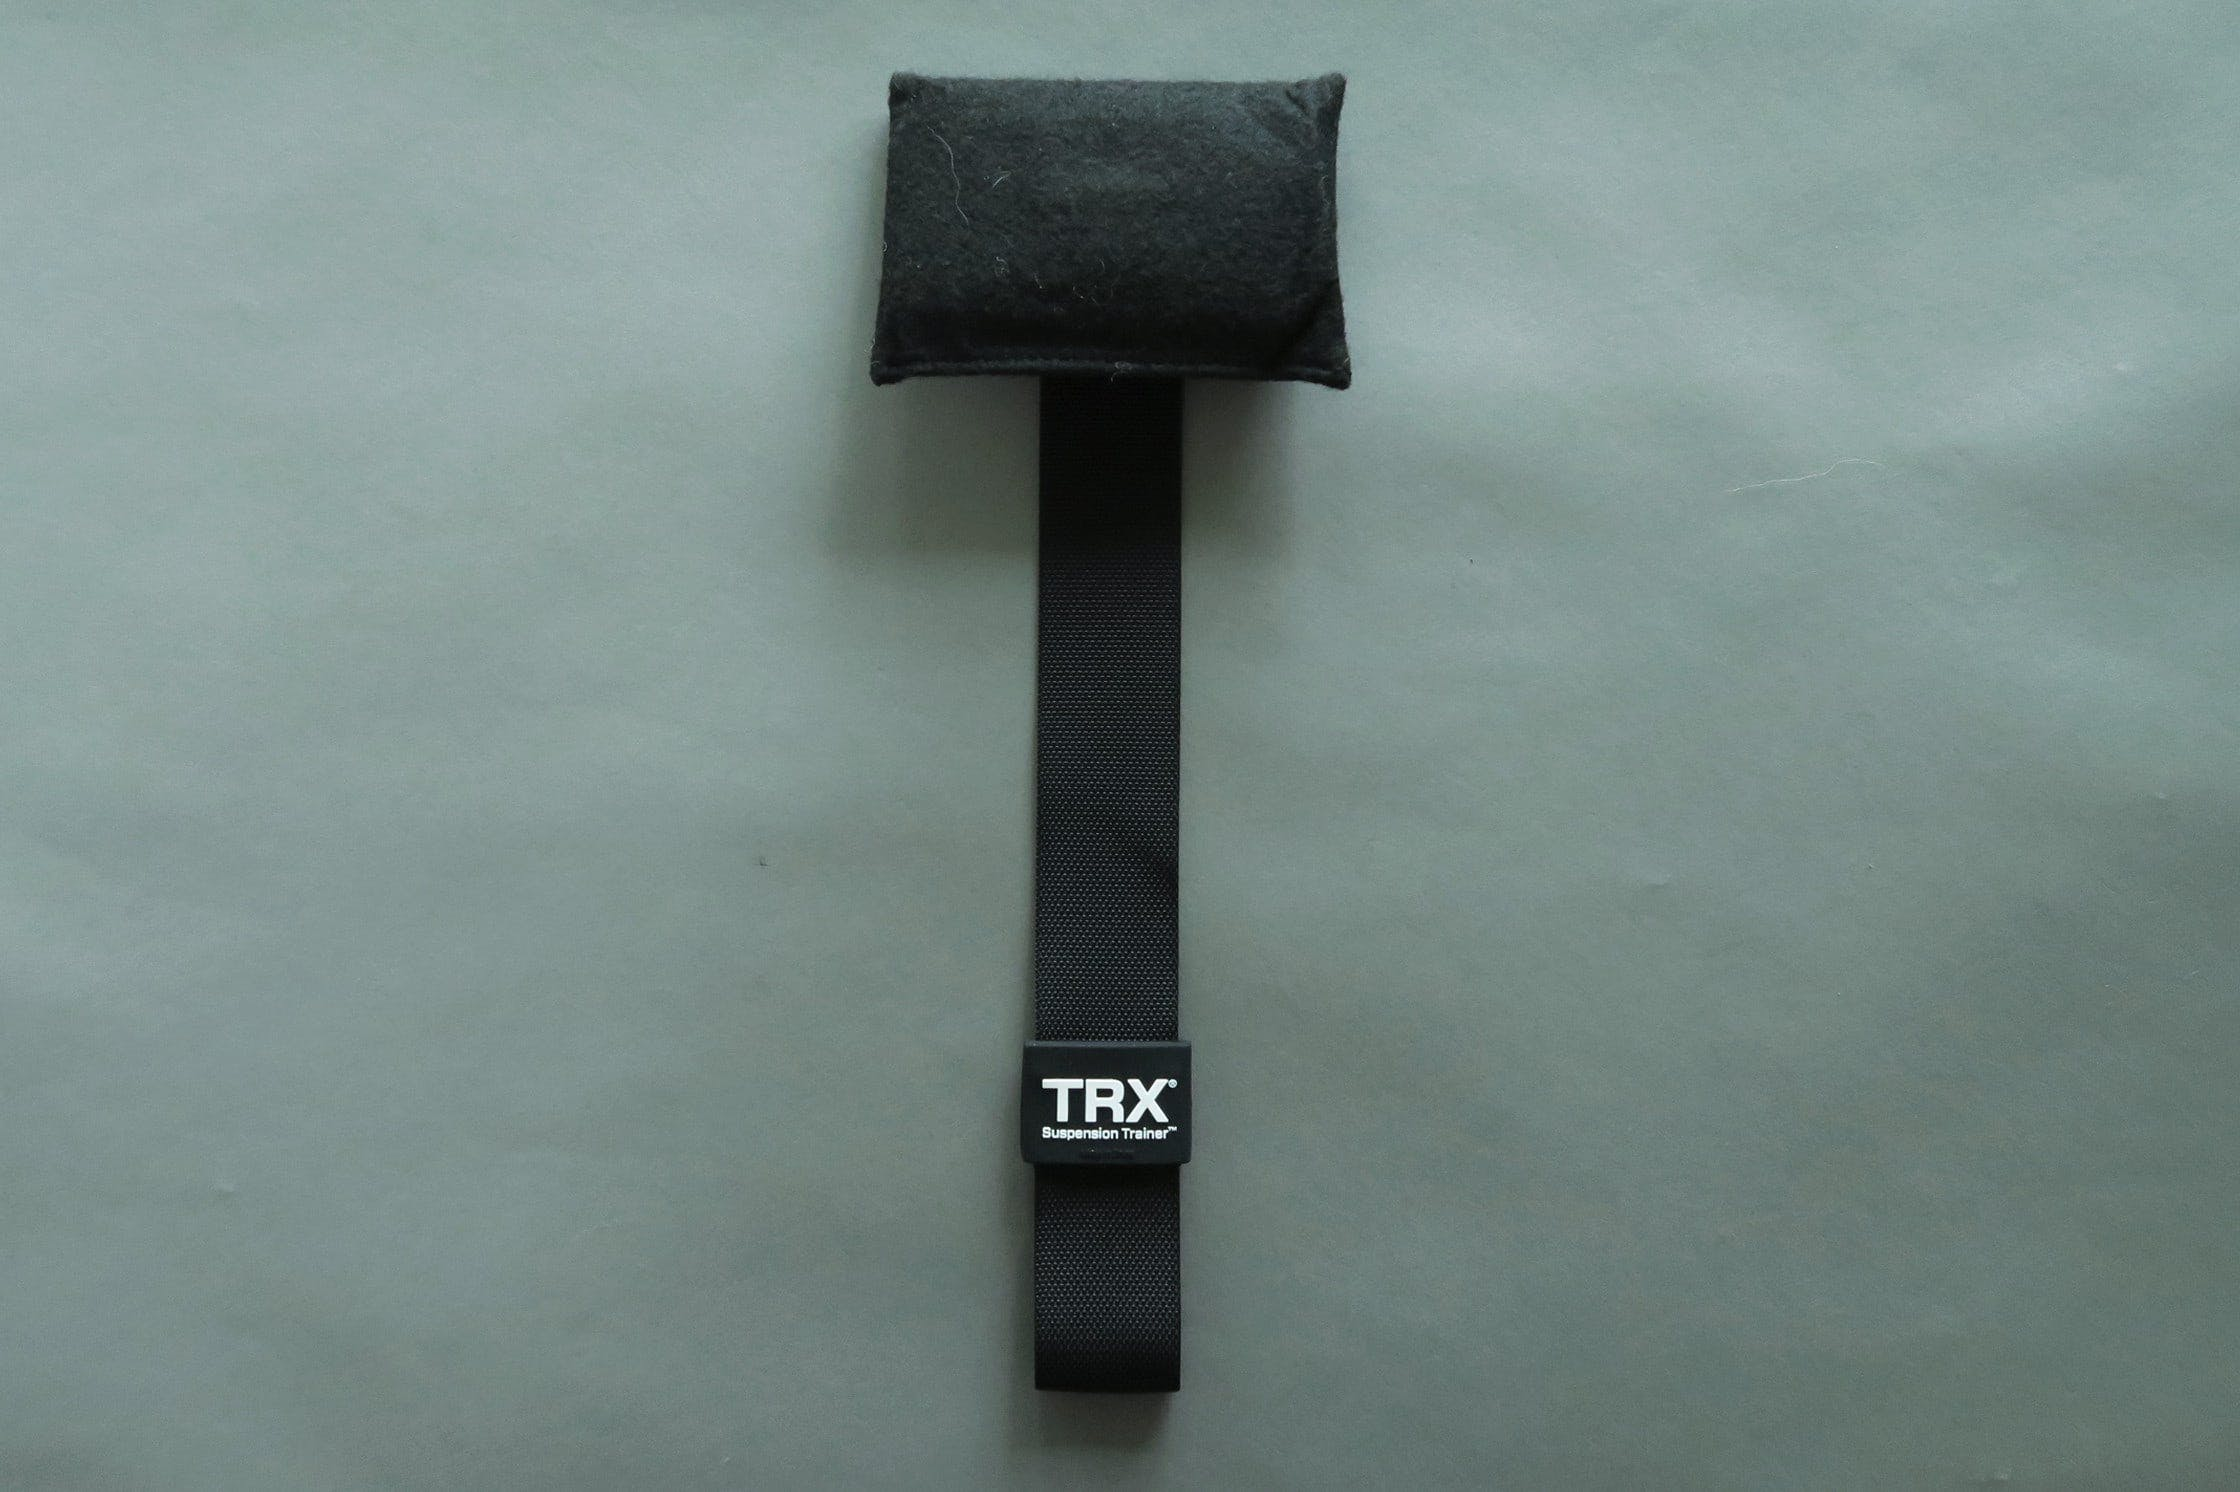 TRX Go Suspension Training Kit Door Anchor